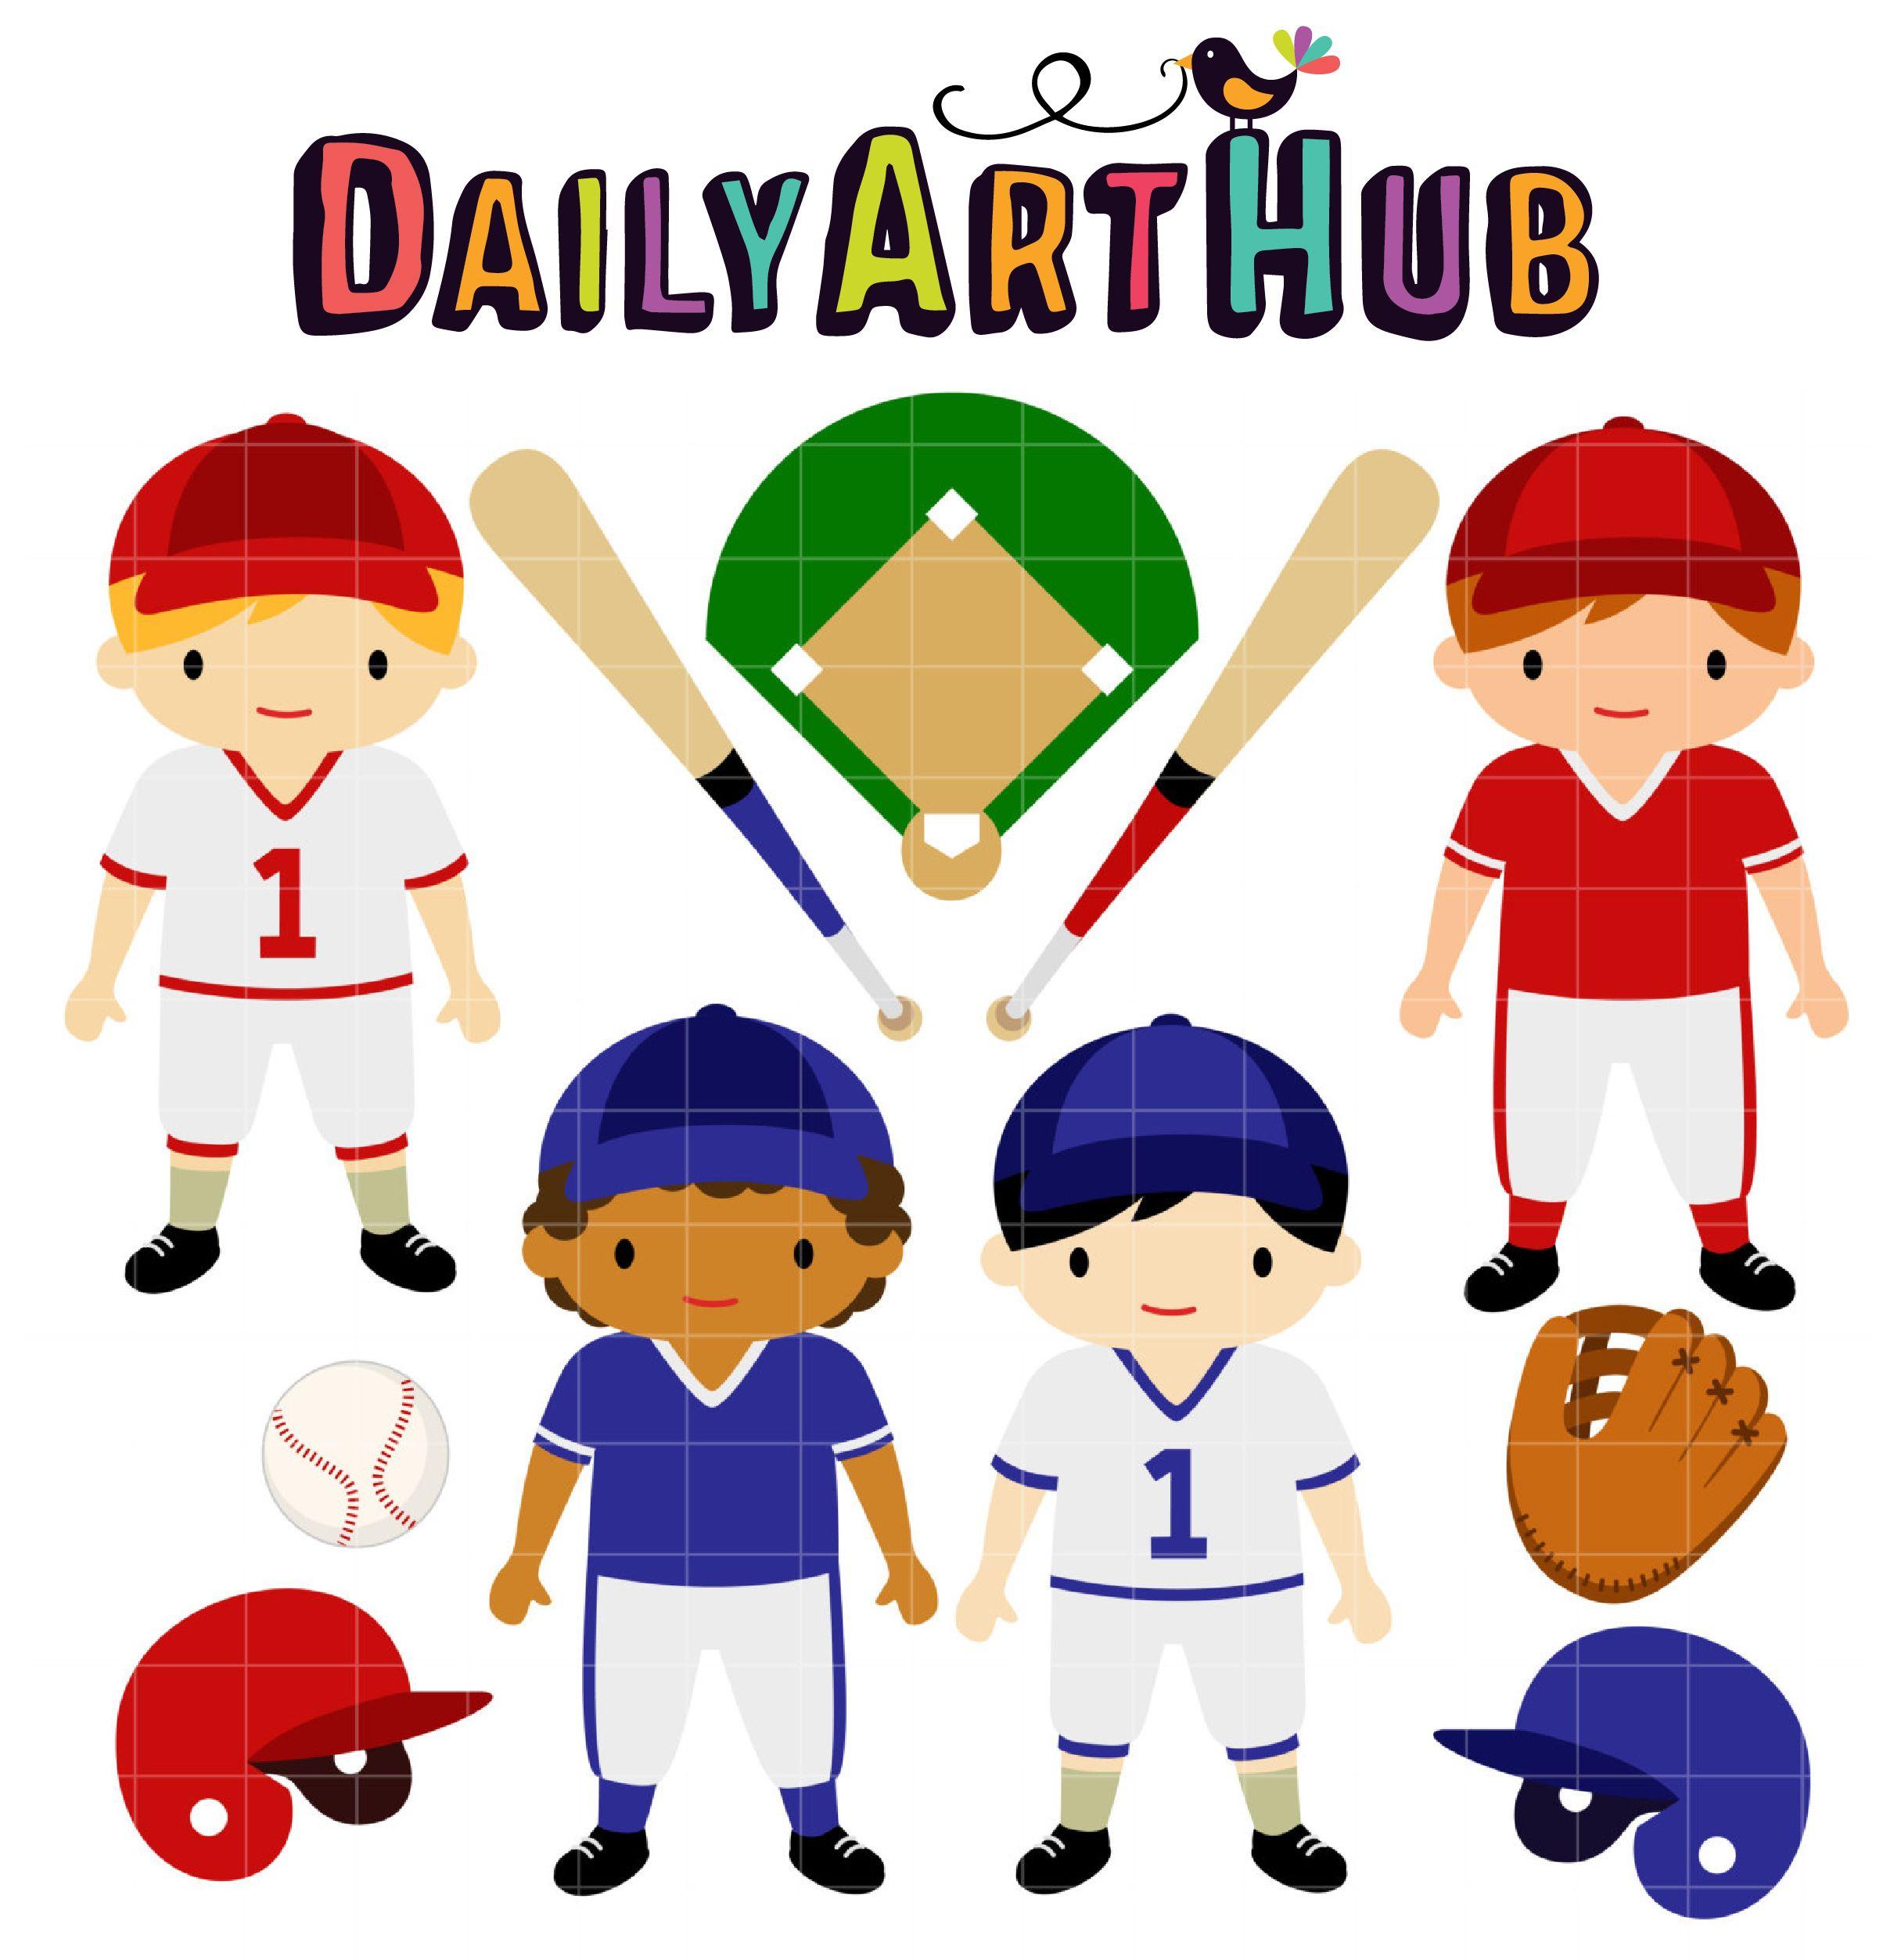 Baseball Kids Clip Art Set Daily Art Hub Free Clip Art Everyday Kids Clipart Clip Art Art Hub